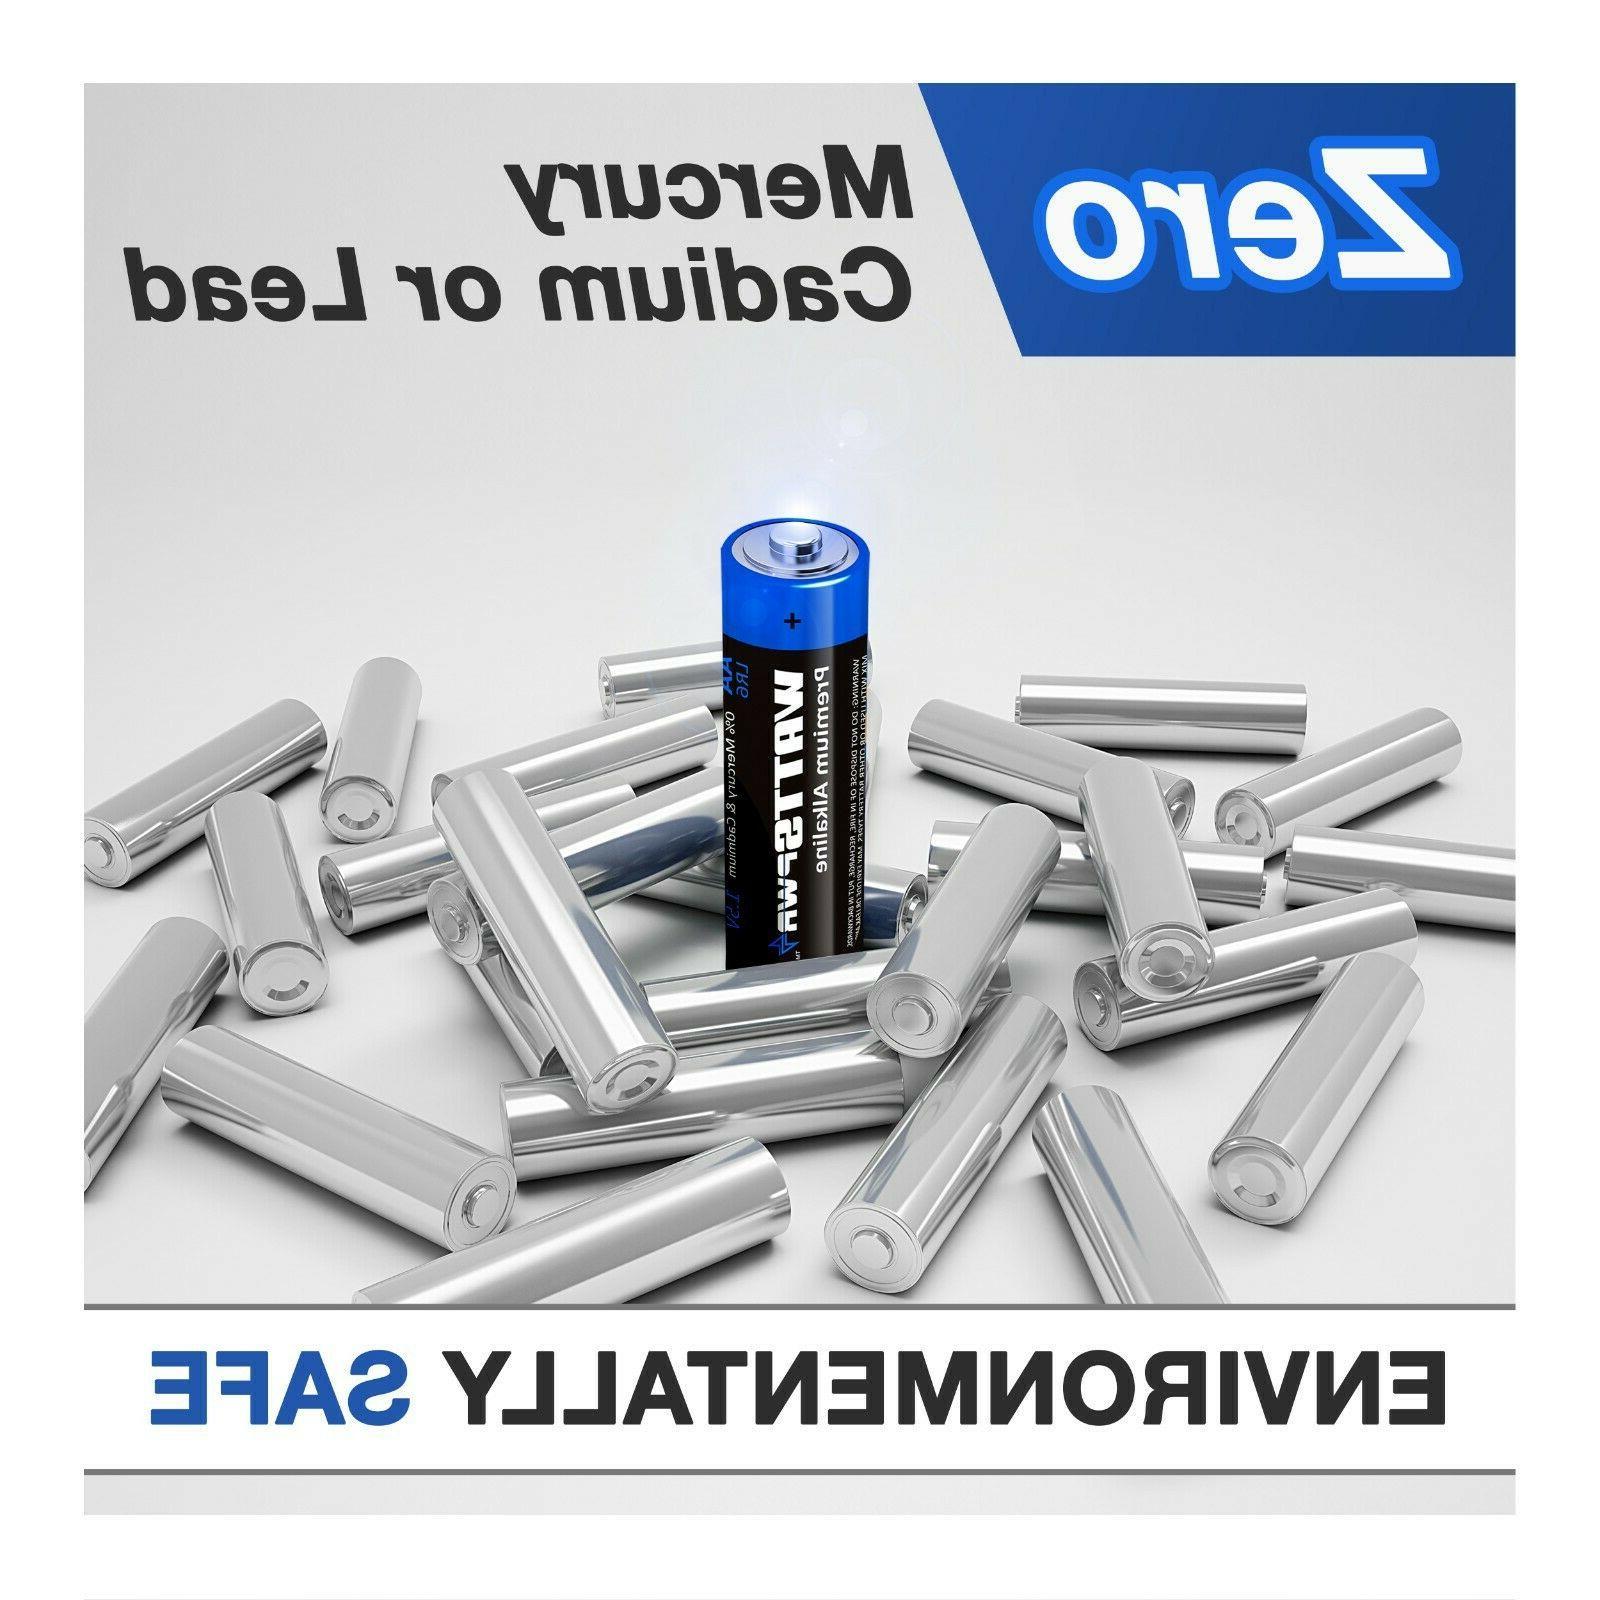 WATTSPOWER AA Batteries, Alkaline Double A Batteries